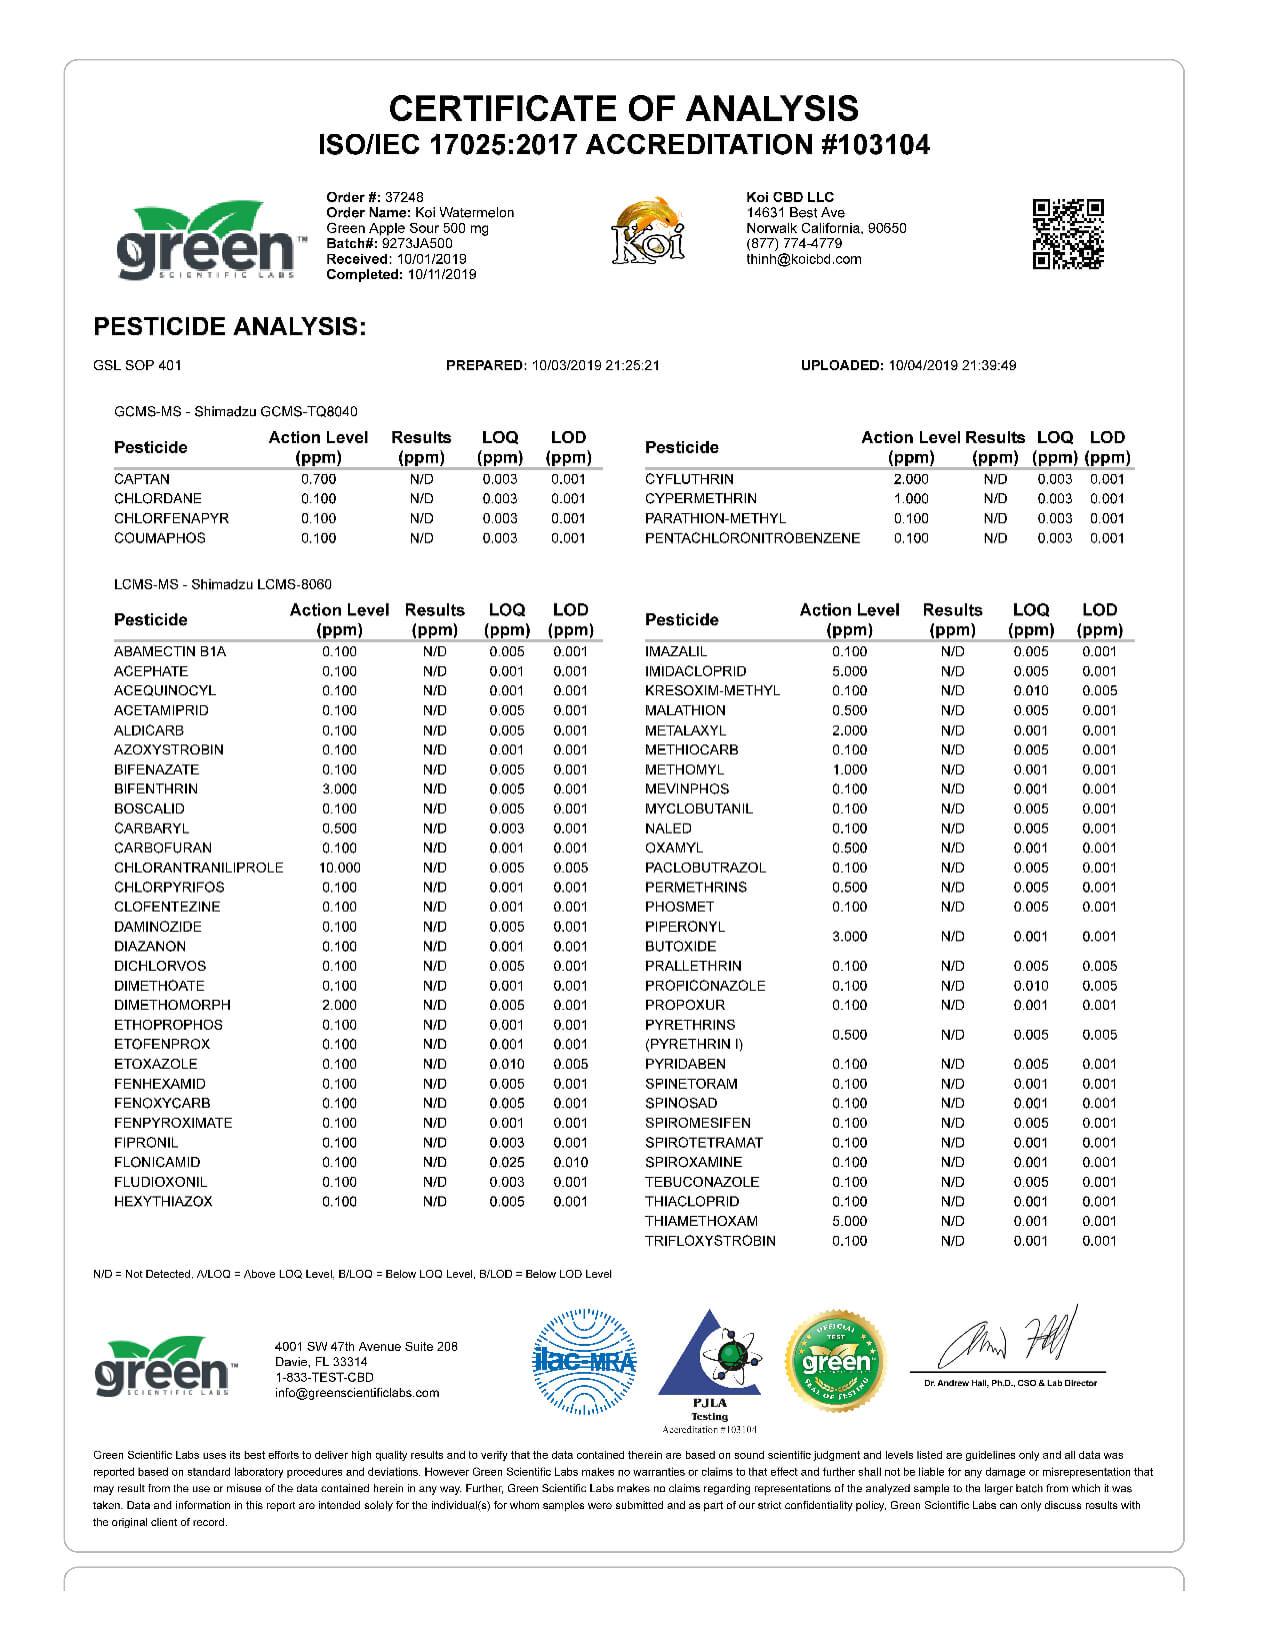 Koi CBD Watermelon Green Apple Sour Vape Oil 500mg page3